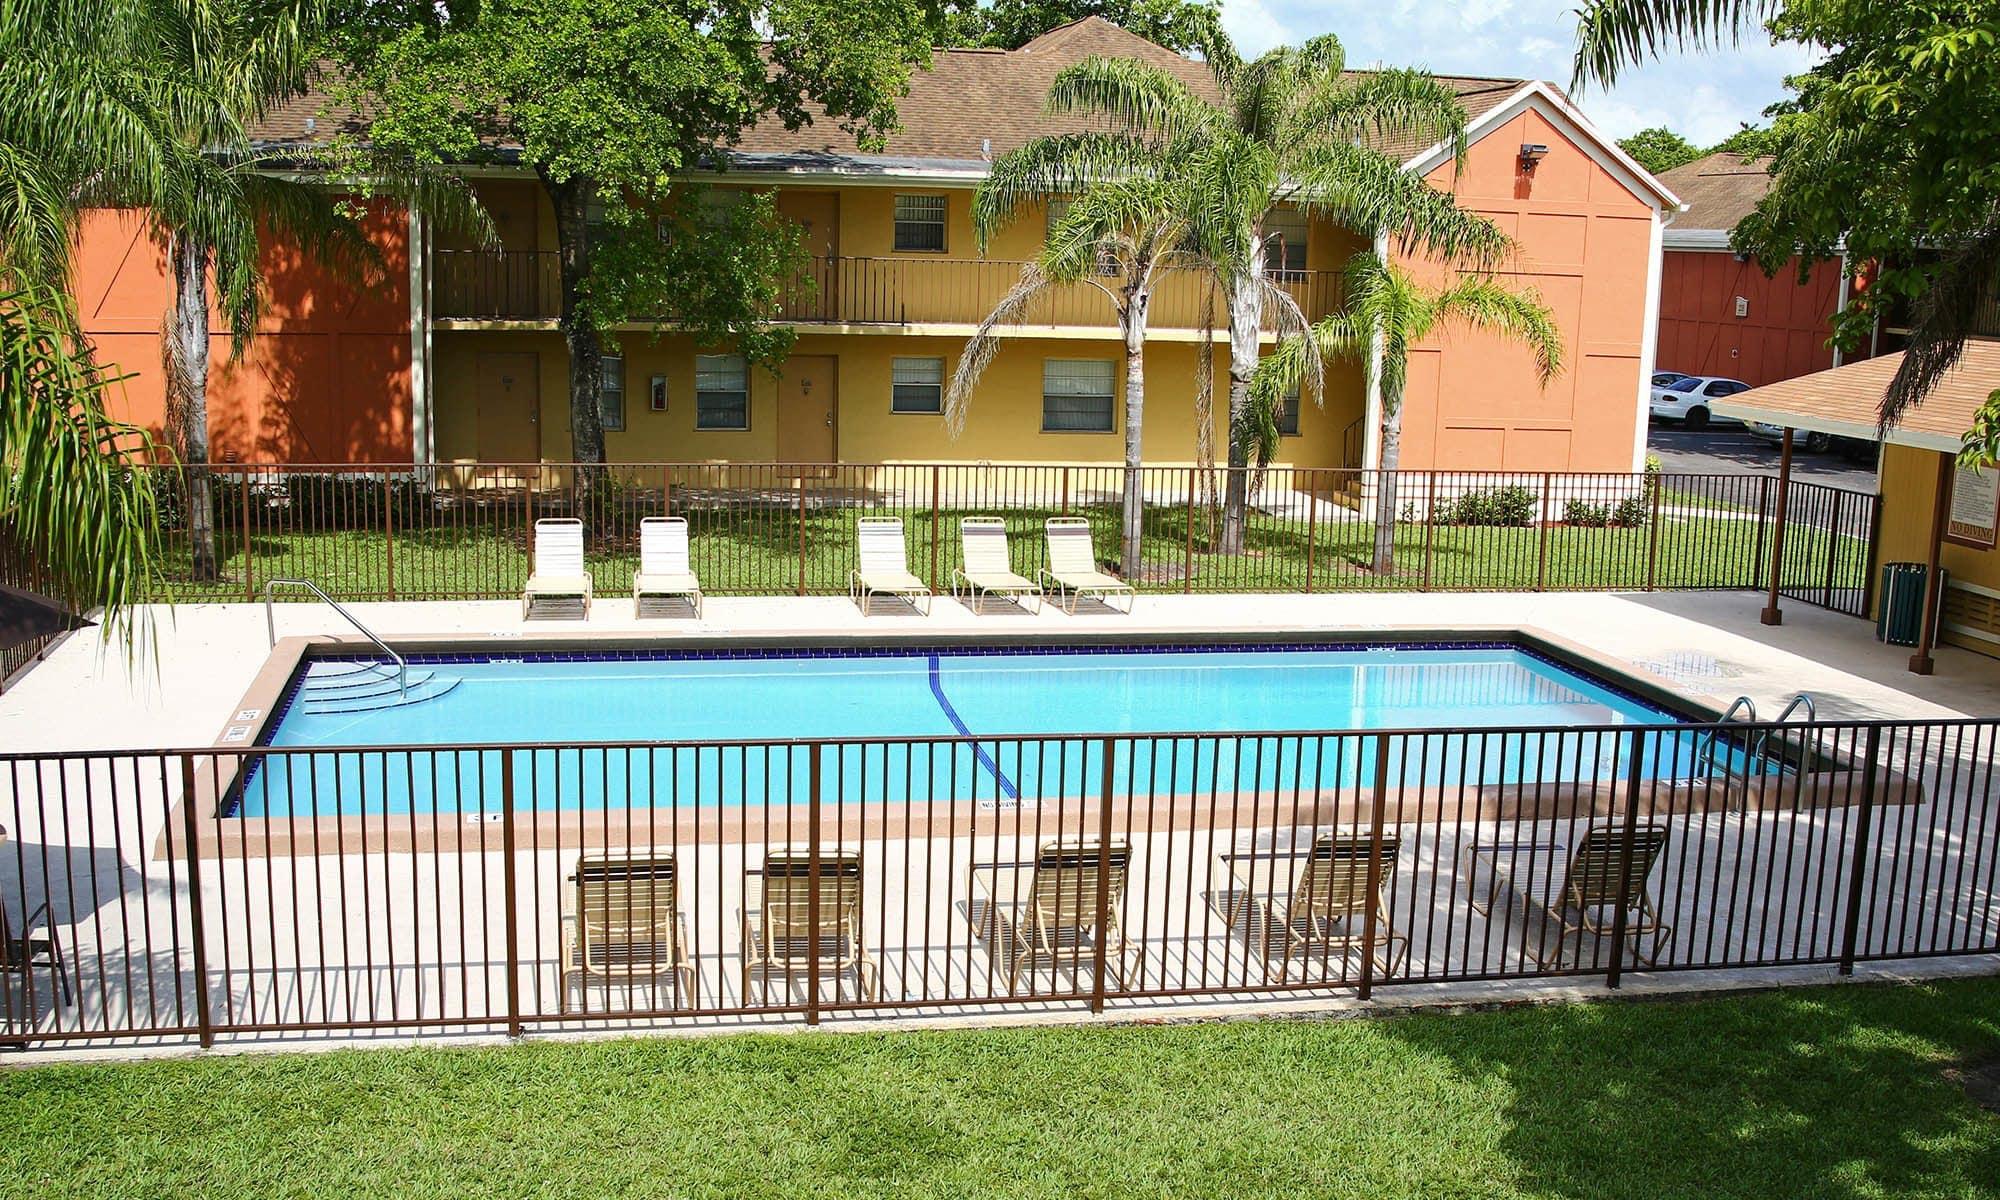 Apartments in Pembroke Pines, FL